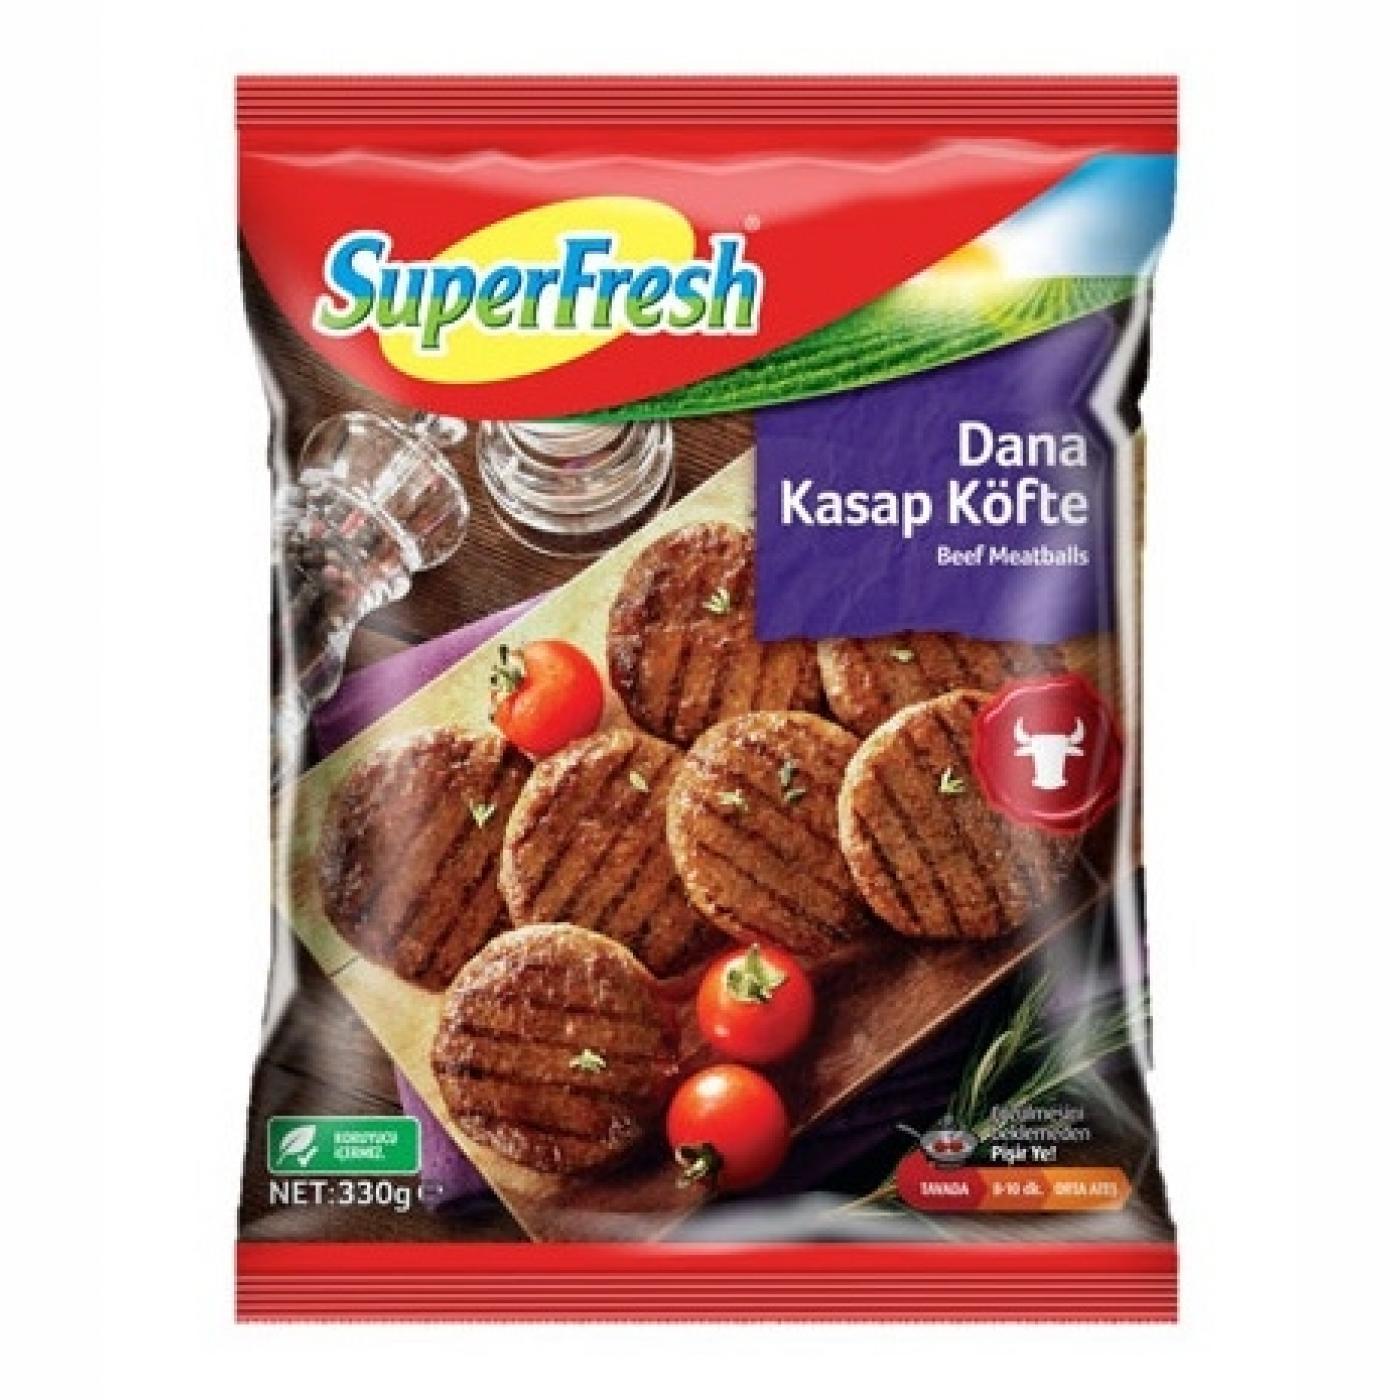 SUPERFRESH KASAP KÖFTE 330GR